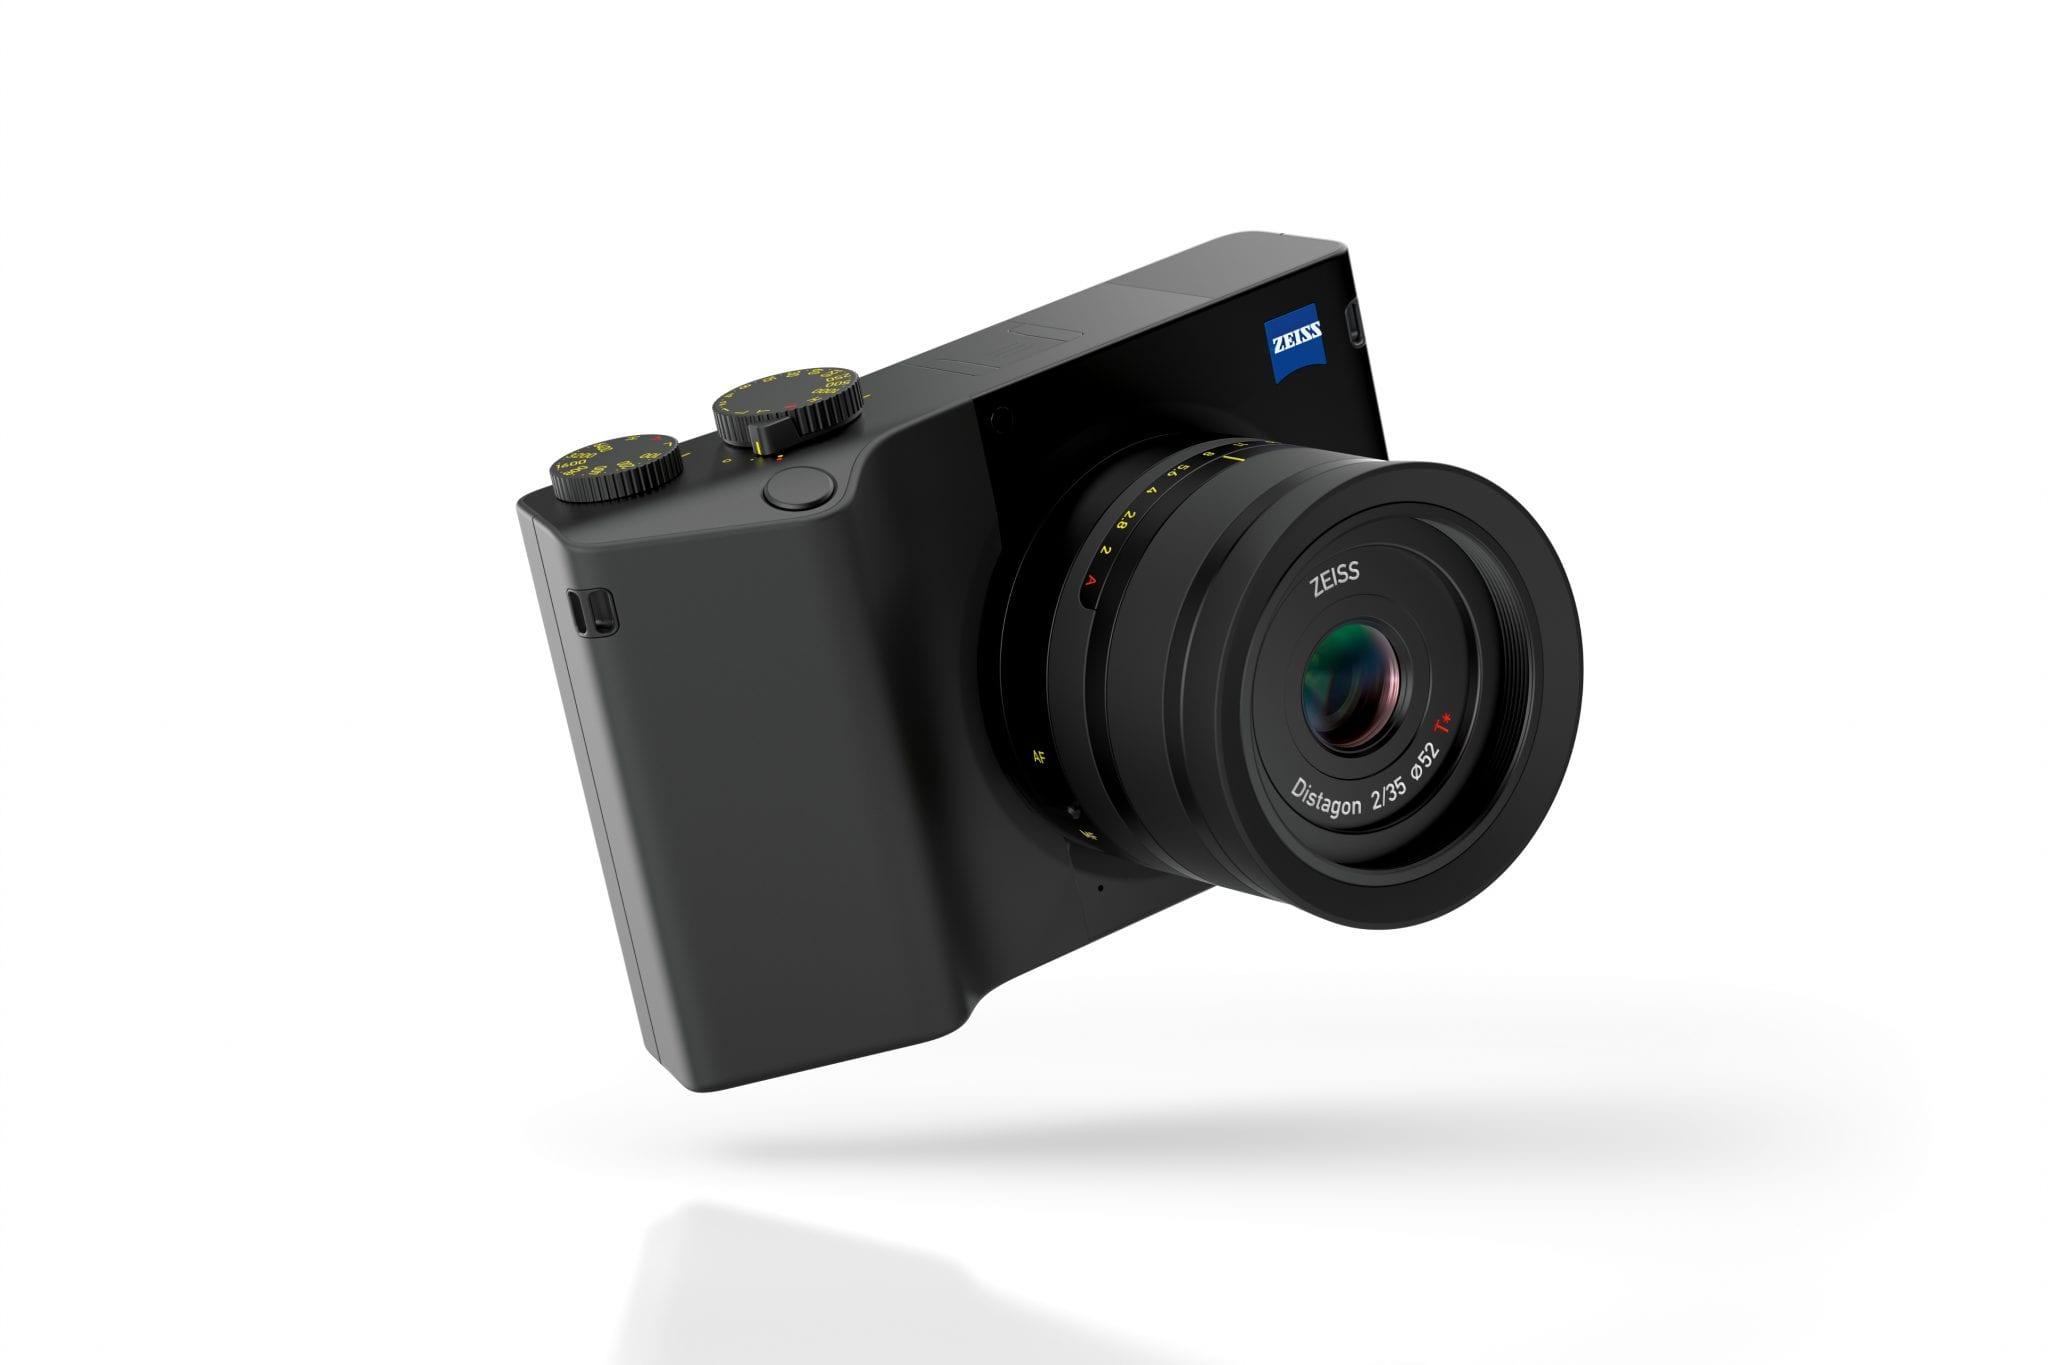 ZX1 compact camera